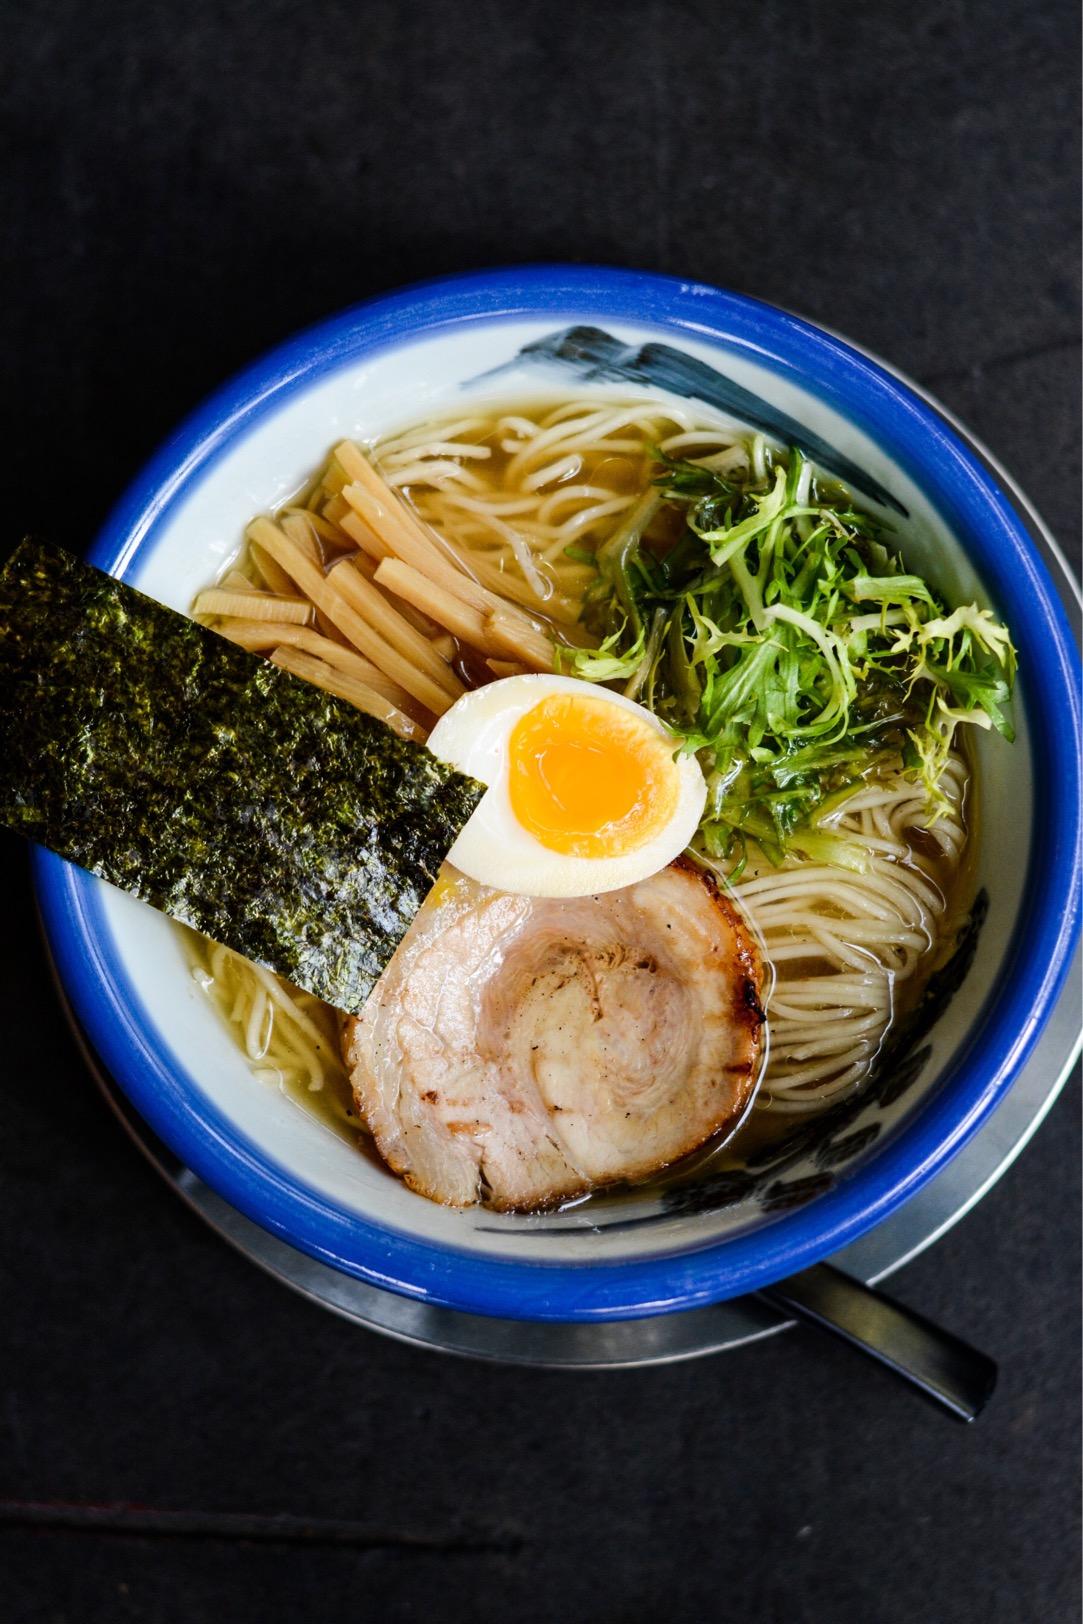 Japan's Afuri Ramen and Dumpling to Open First California Location